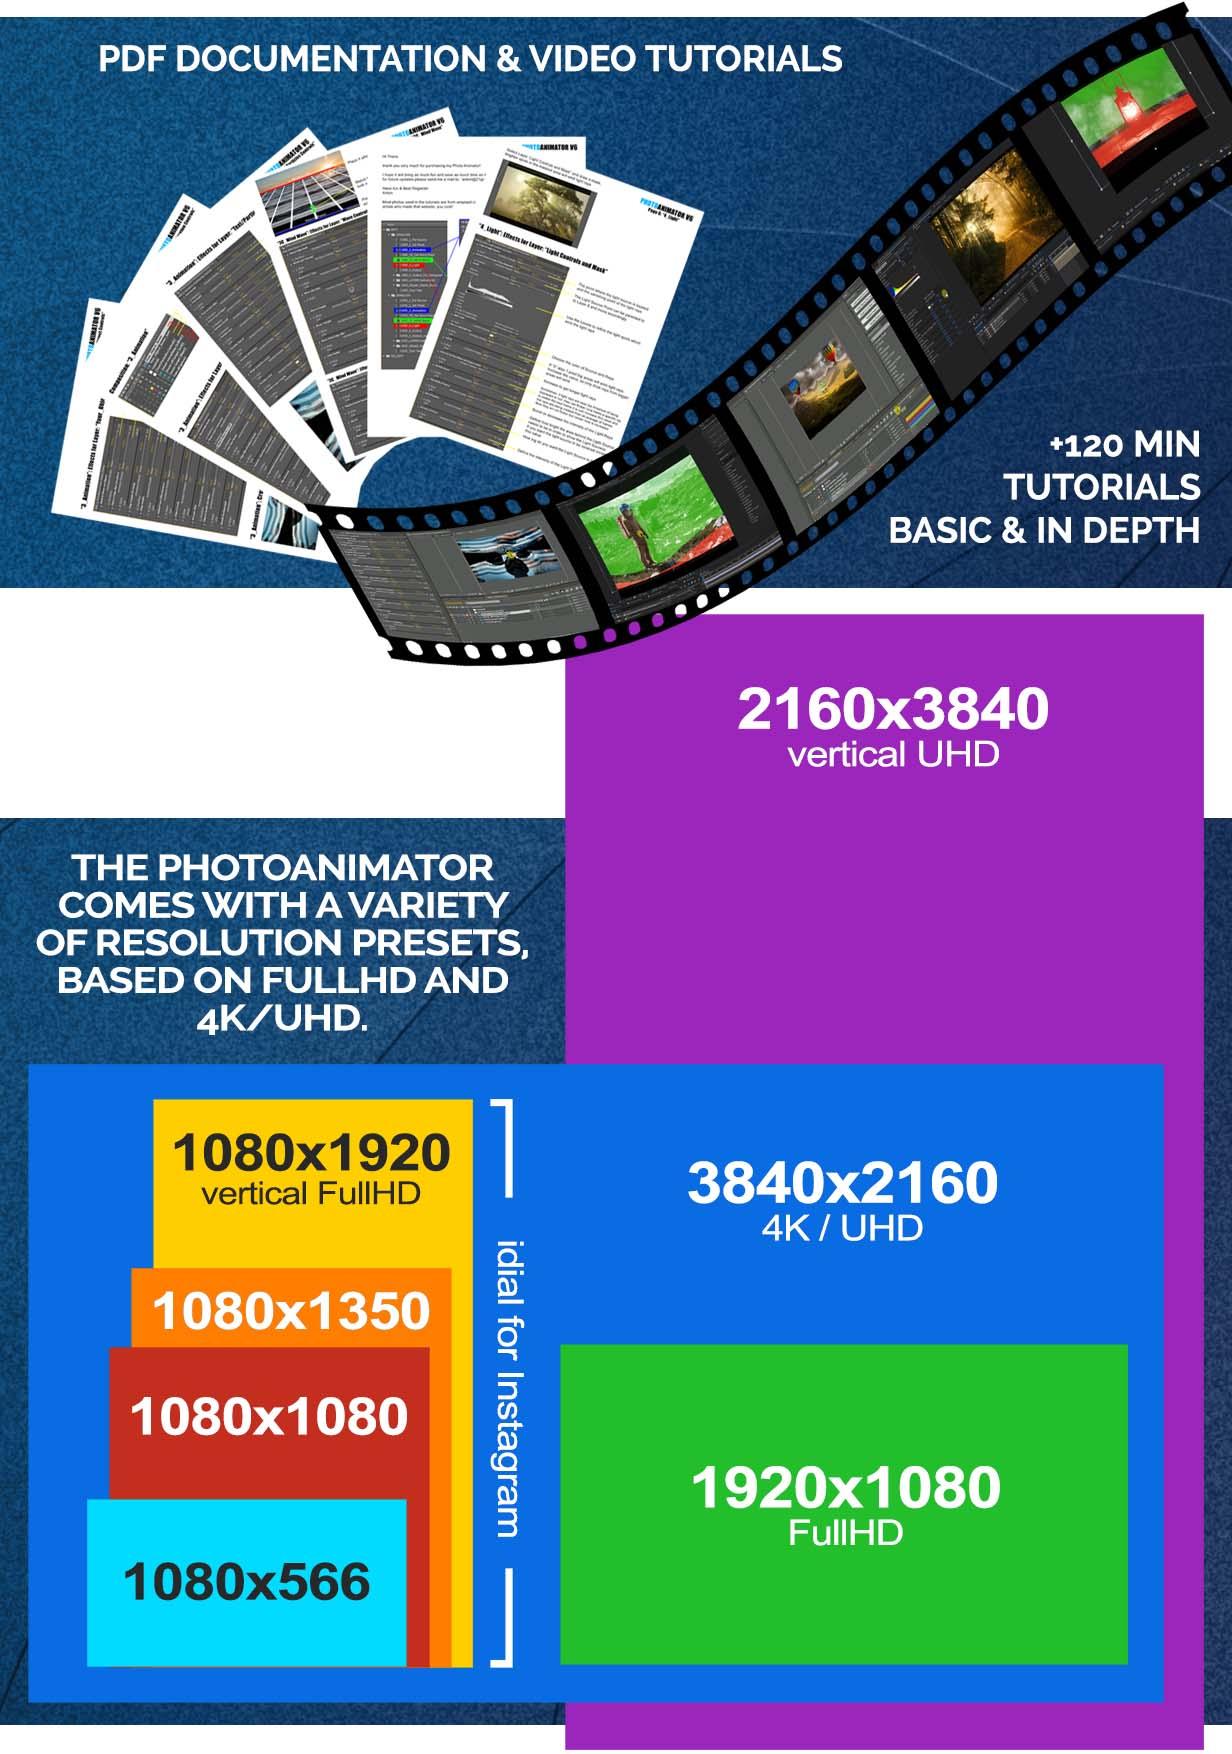 PDF and Video Tutorials